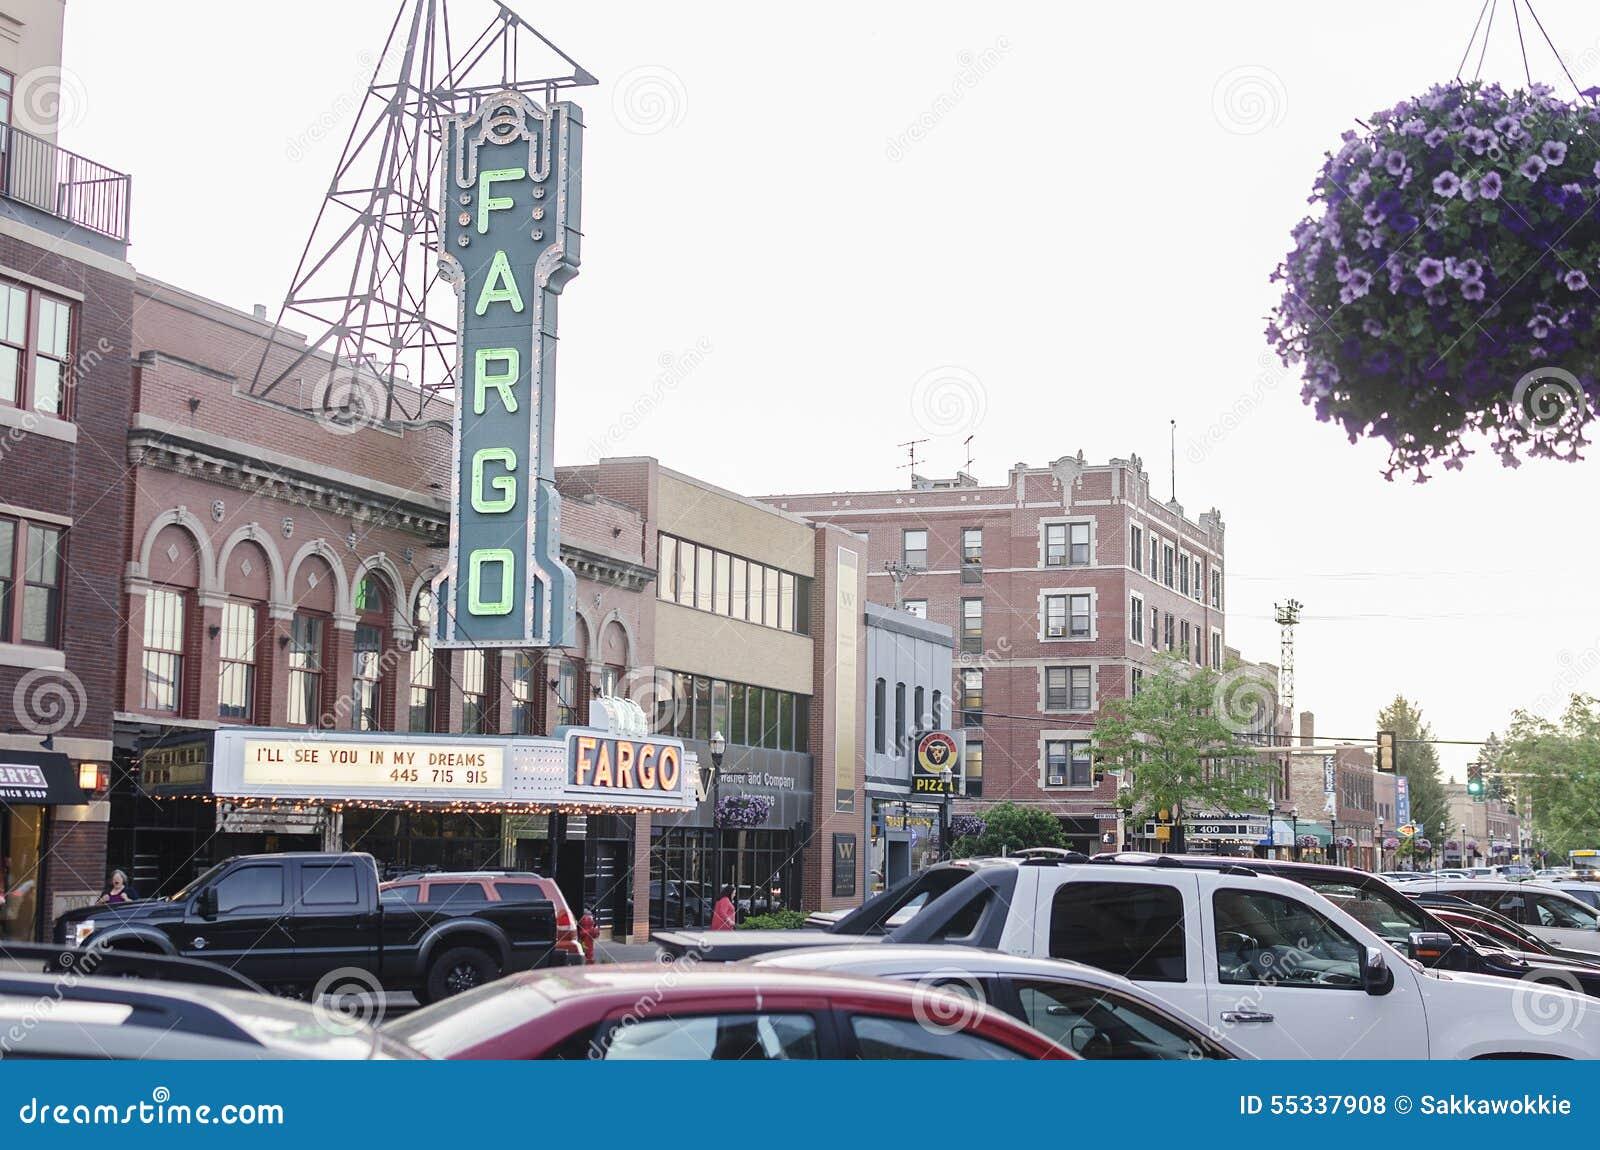 Fargo Restaurants On Th Street